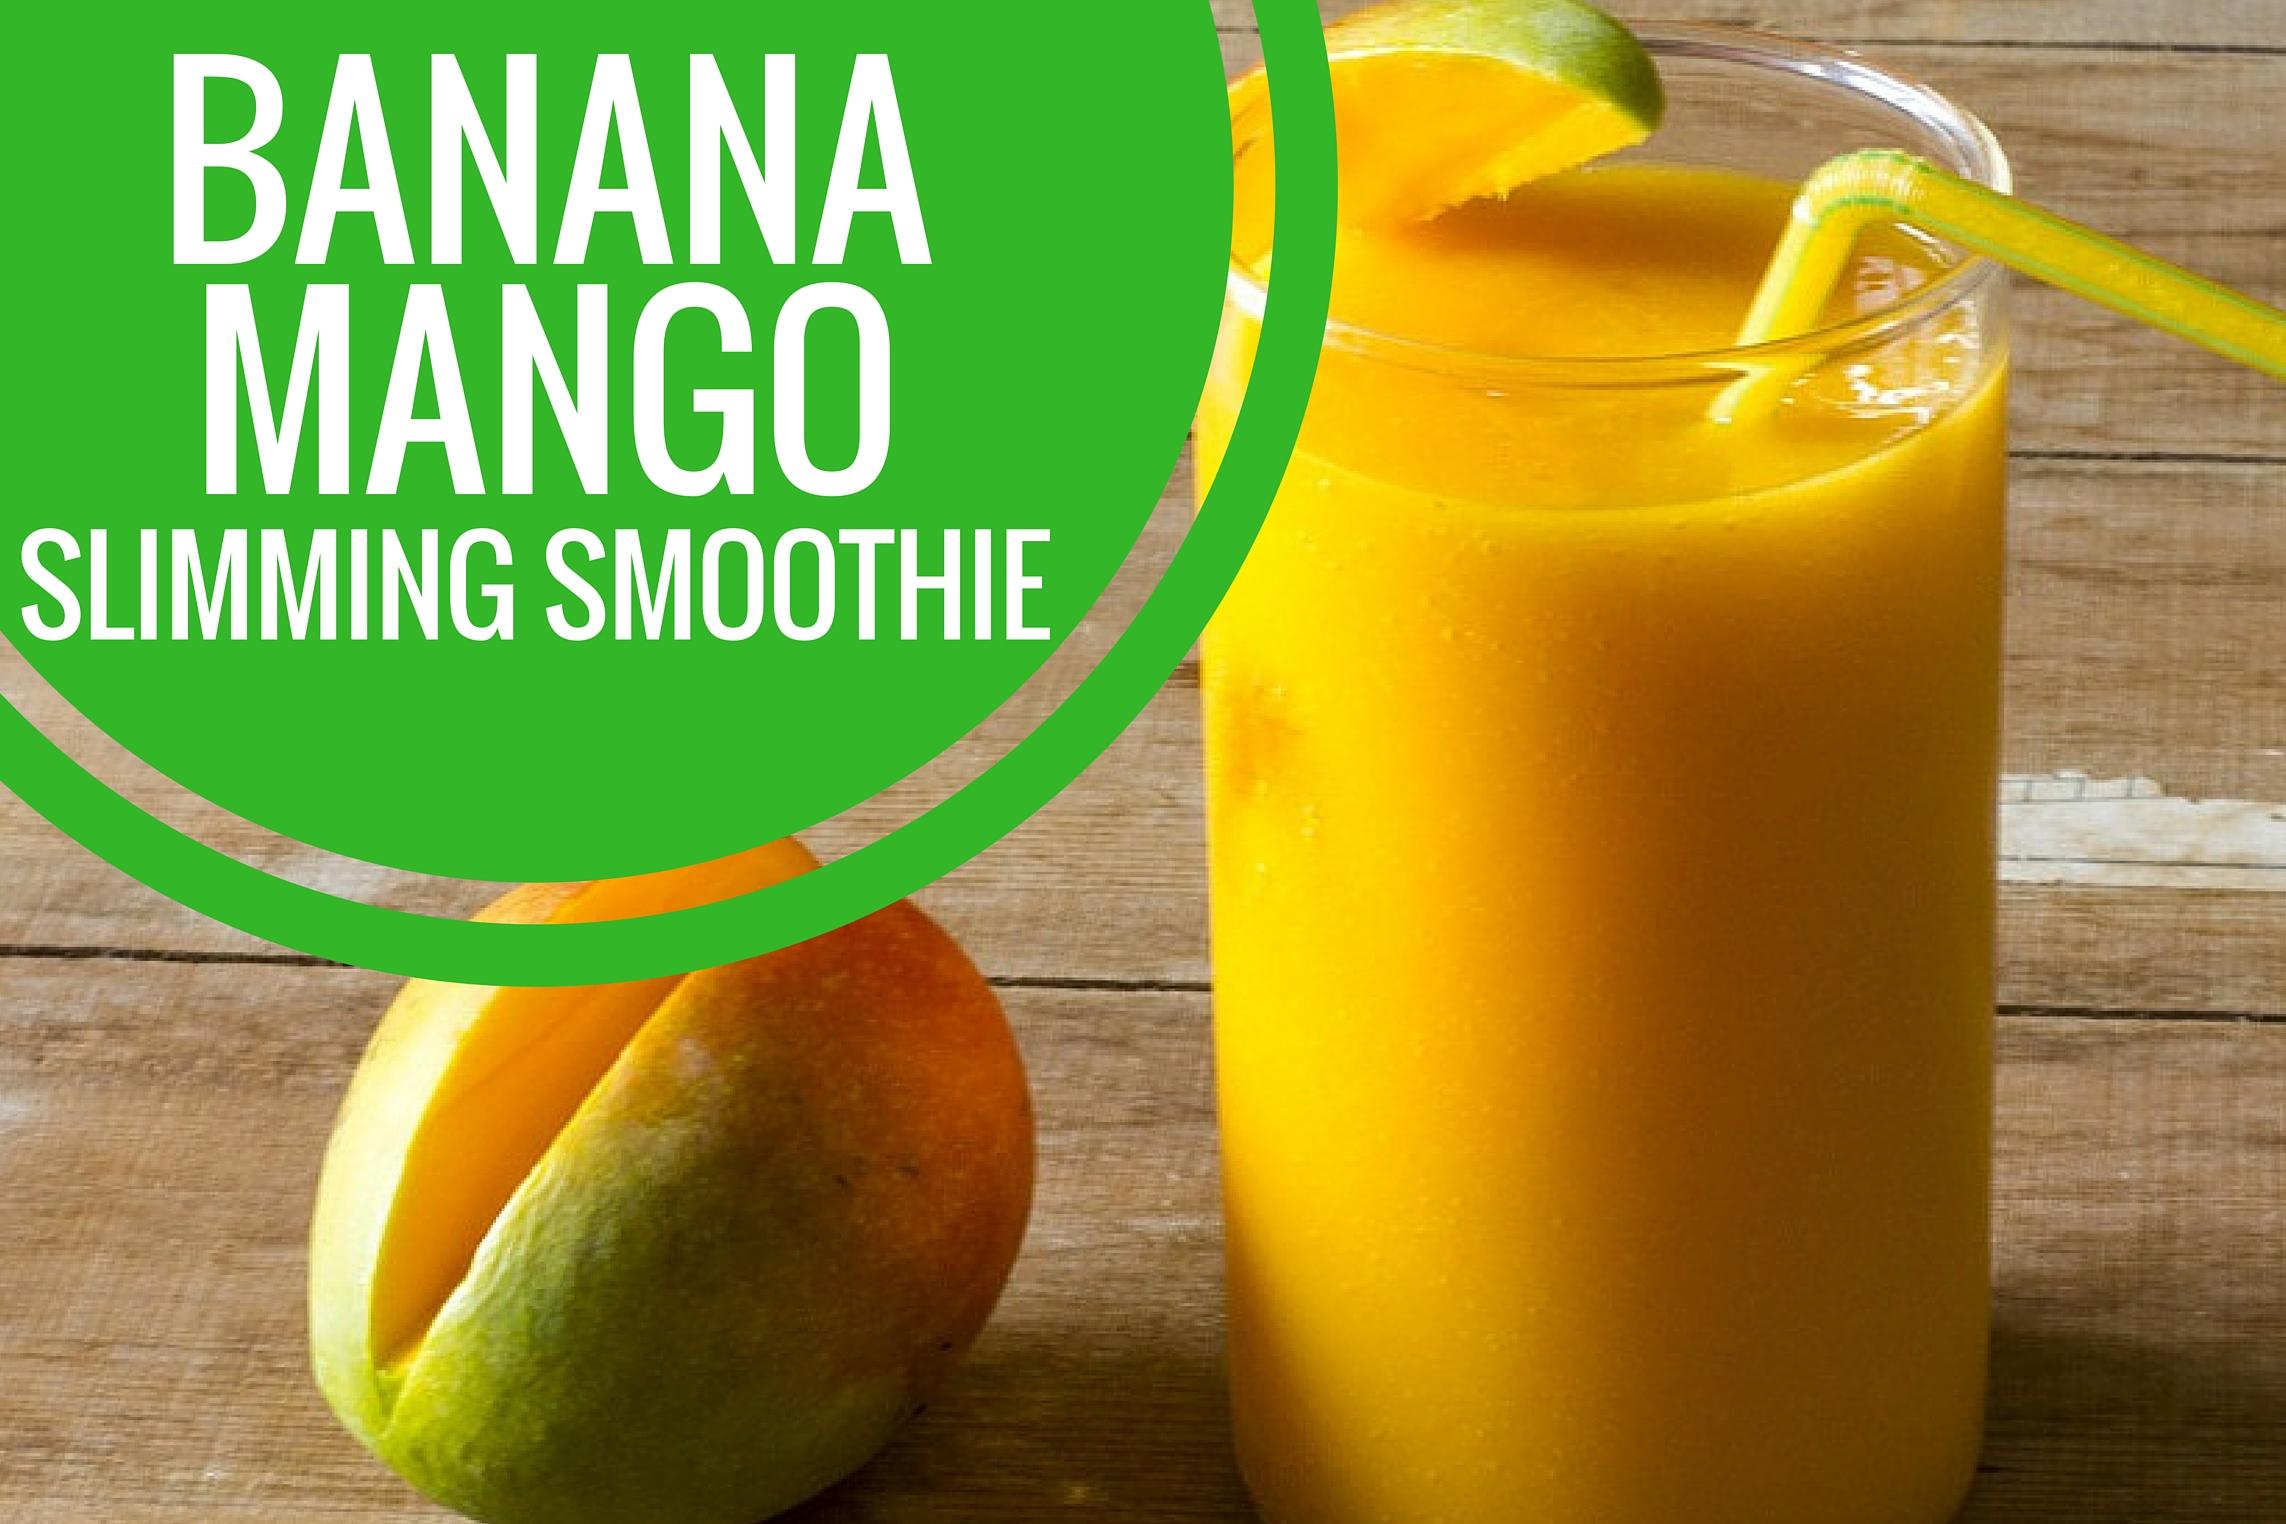 Banana Mango Slimming Smoothie